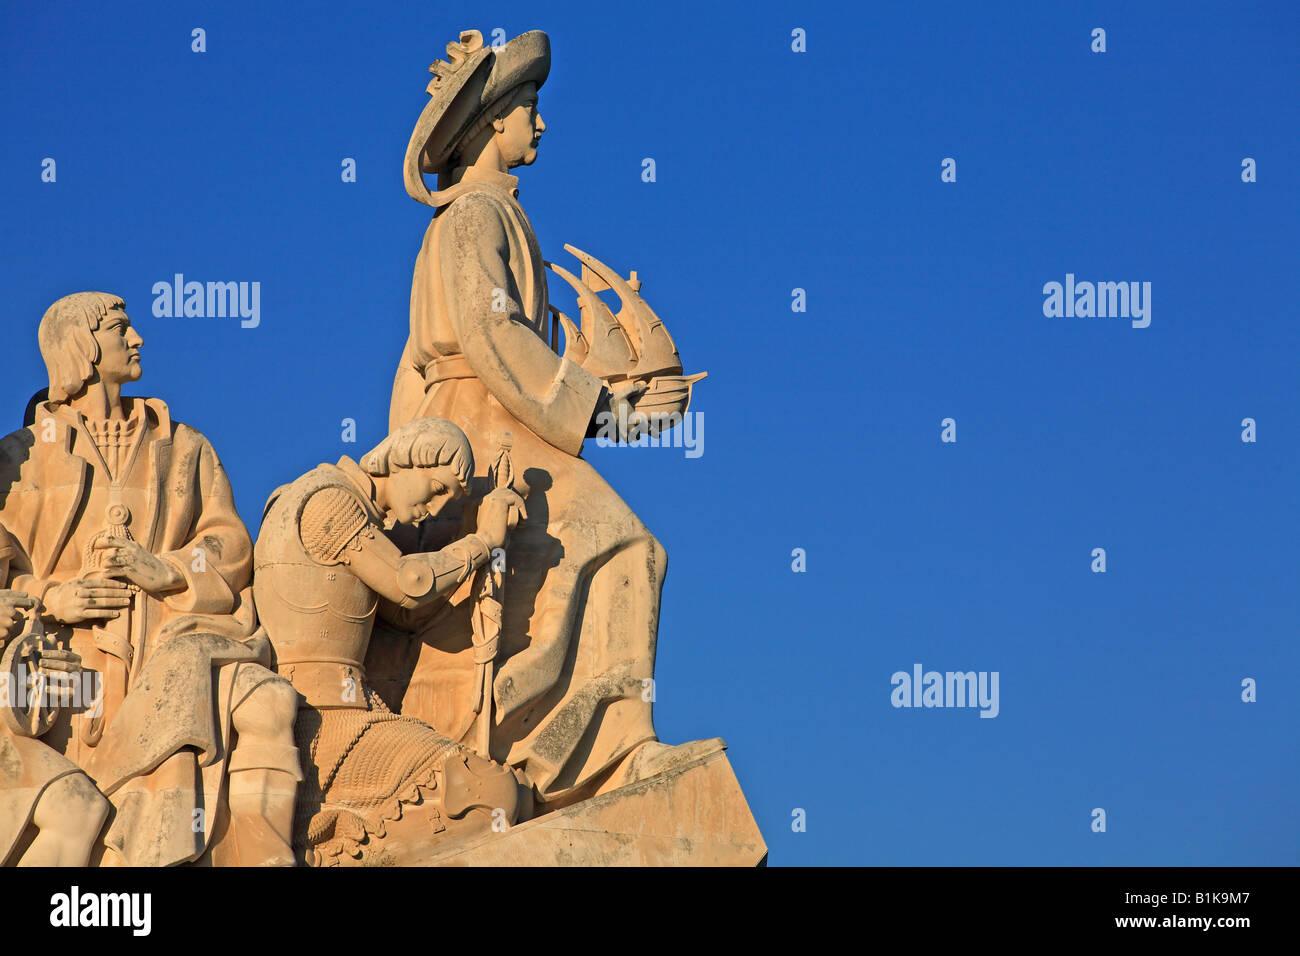 Padrao dos Descobrimentos, seafaring memorial, Lisbon, Portugal - Stock Image